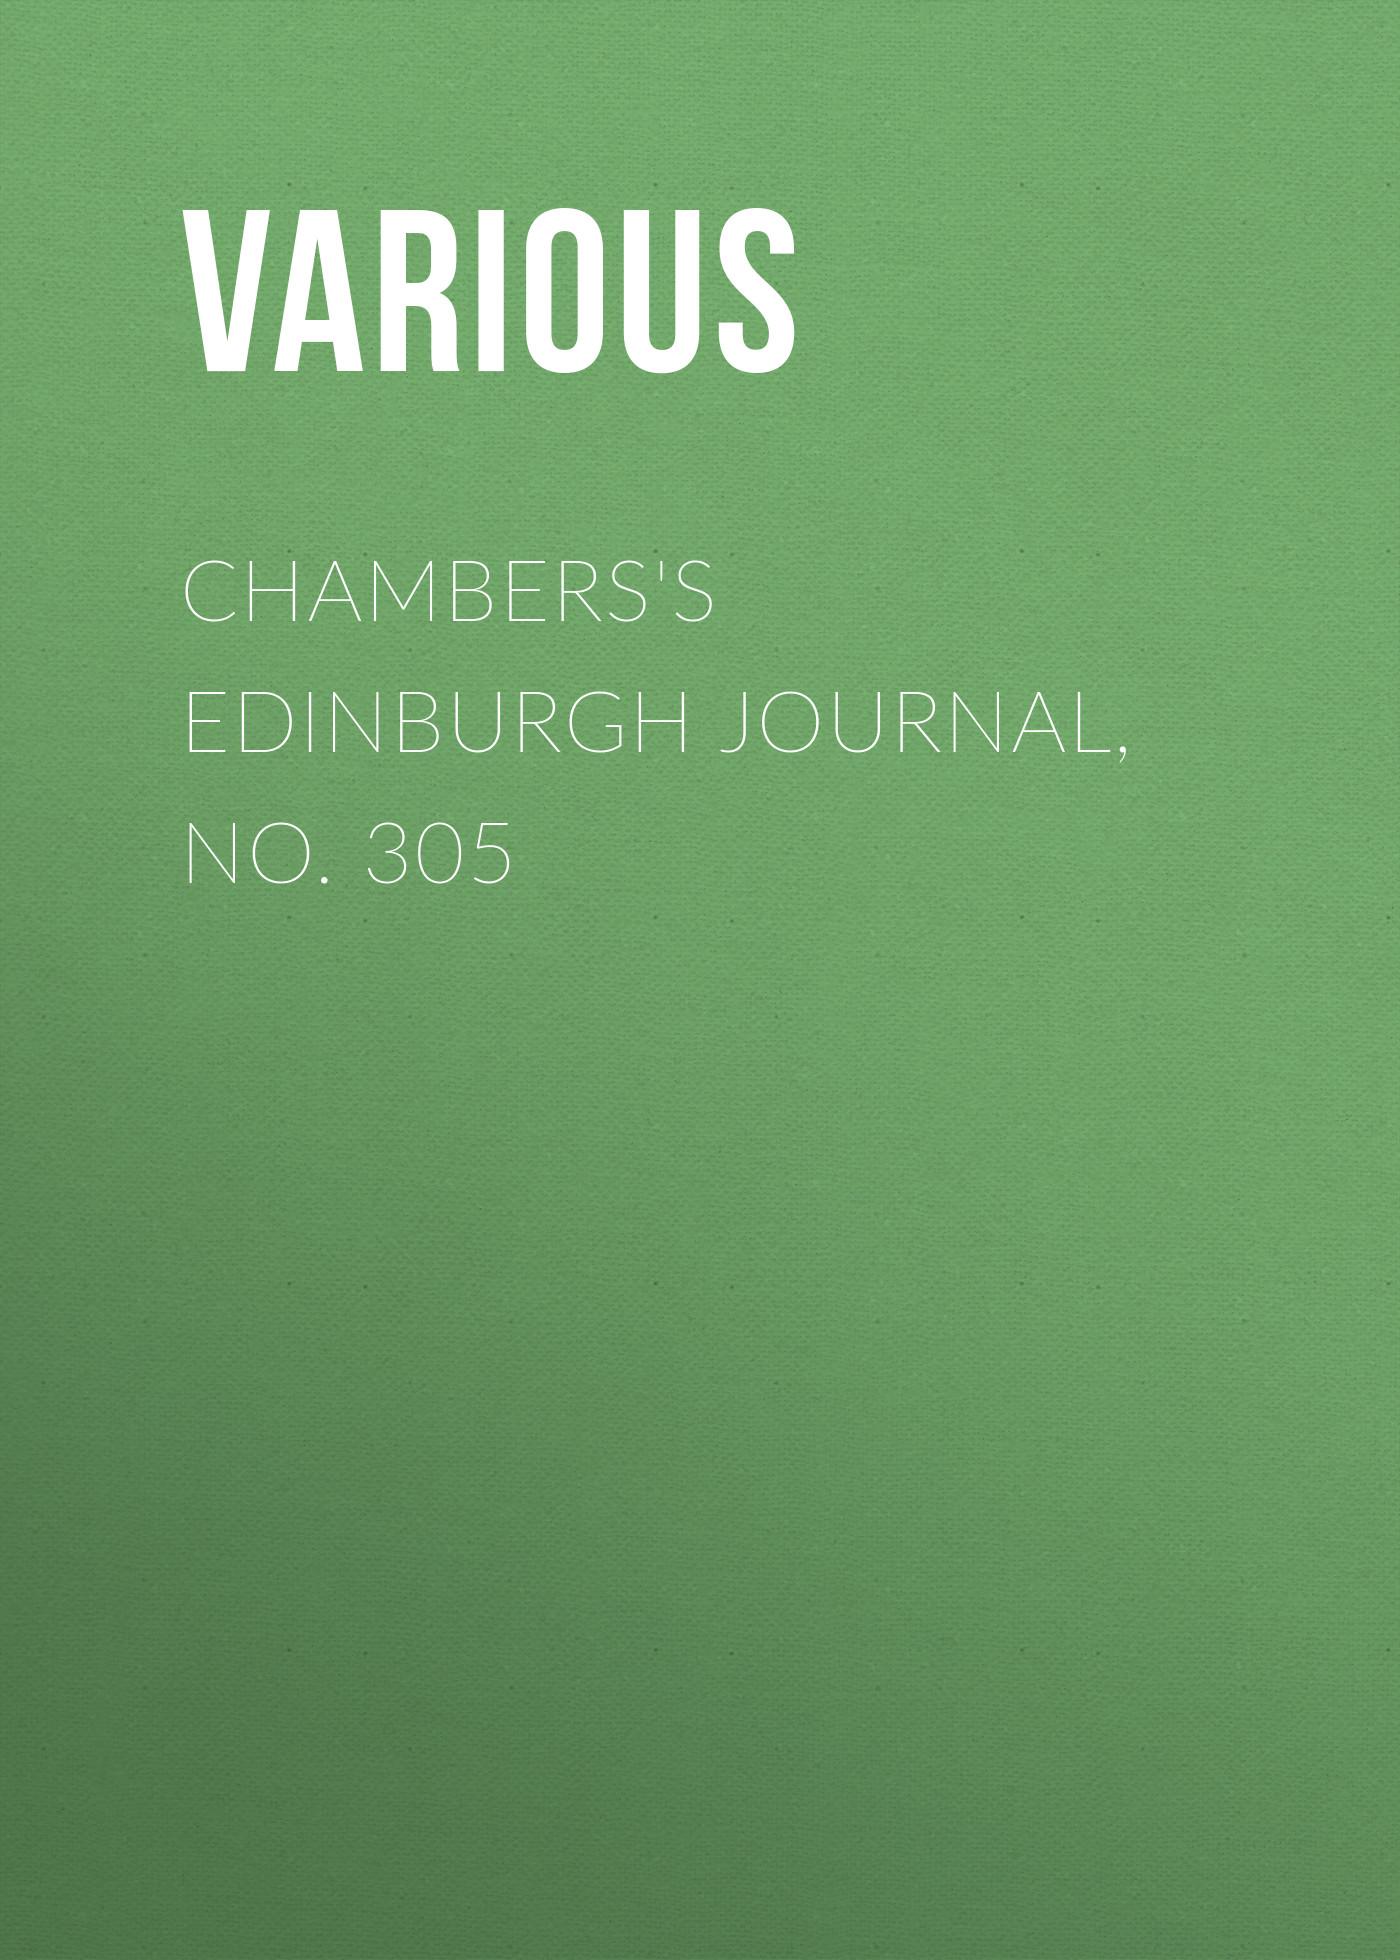 Various Chambers's Edinburgh Journal, No. 305 lau edinburgh